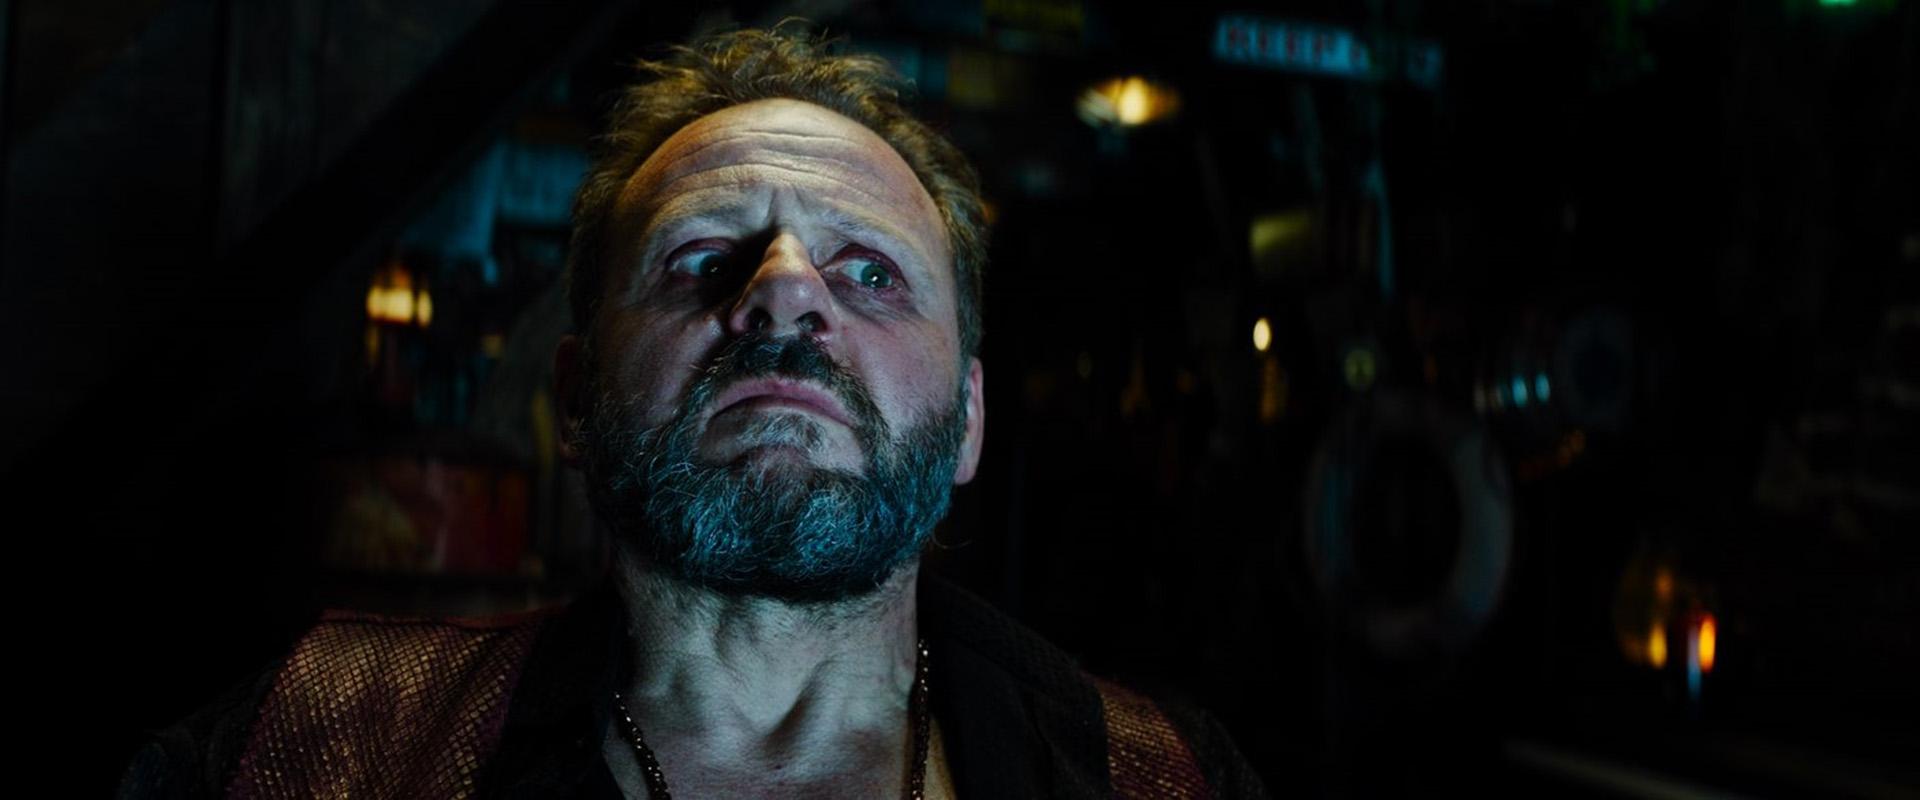 Snake Eyes: G.I. Joe Origins   2021   WEB-DL   XviD   Türkçe Dublaj   1080p - m720p - m1080p   WEB-DL   Tek Link